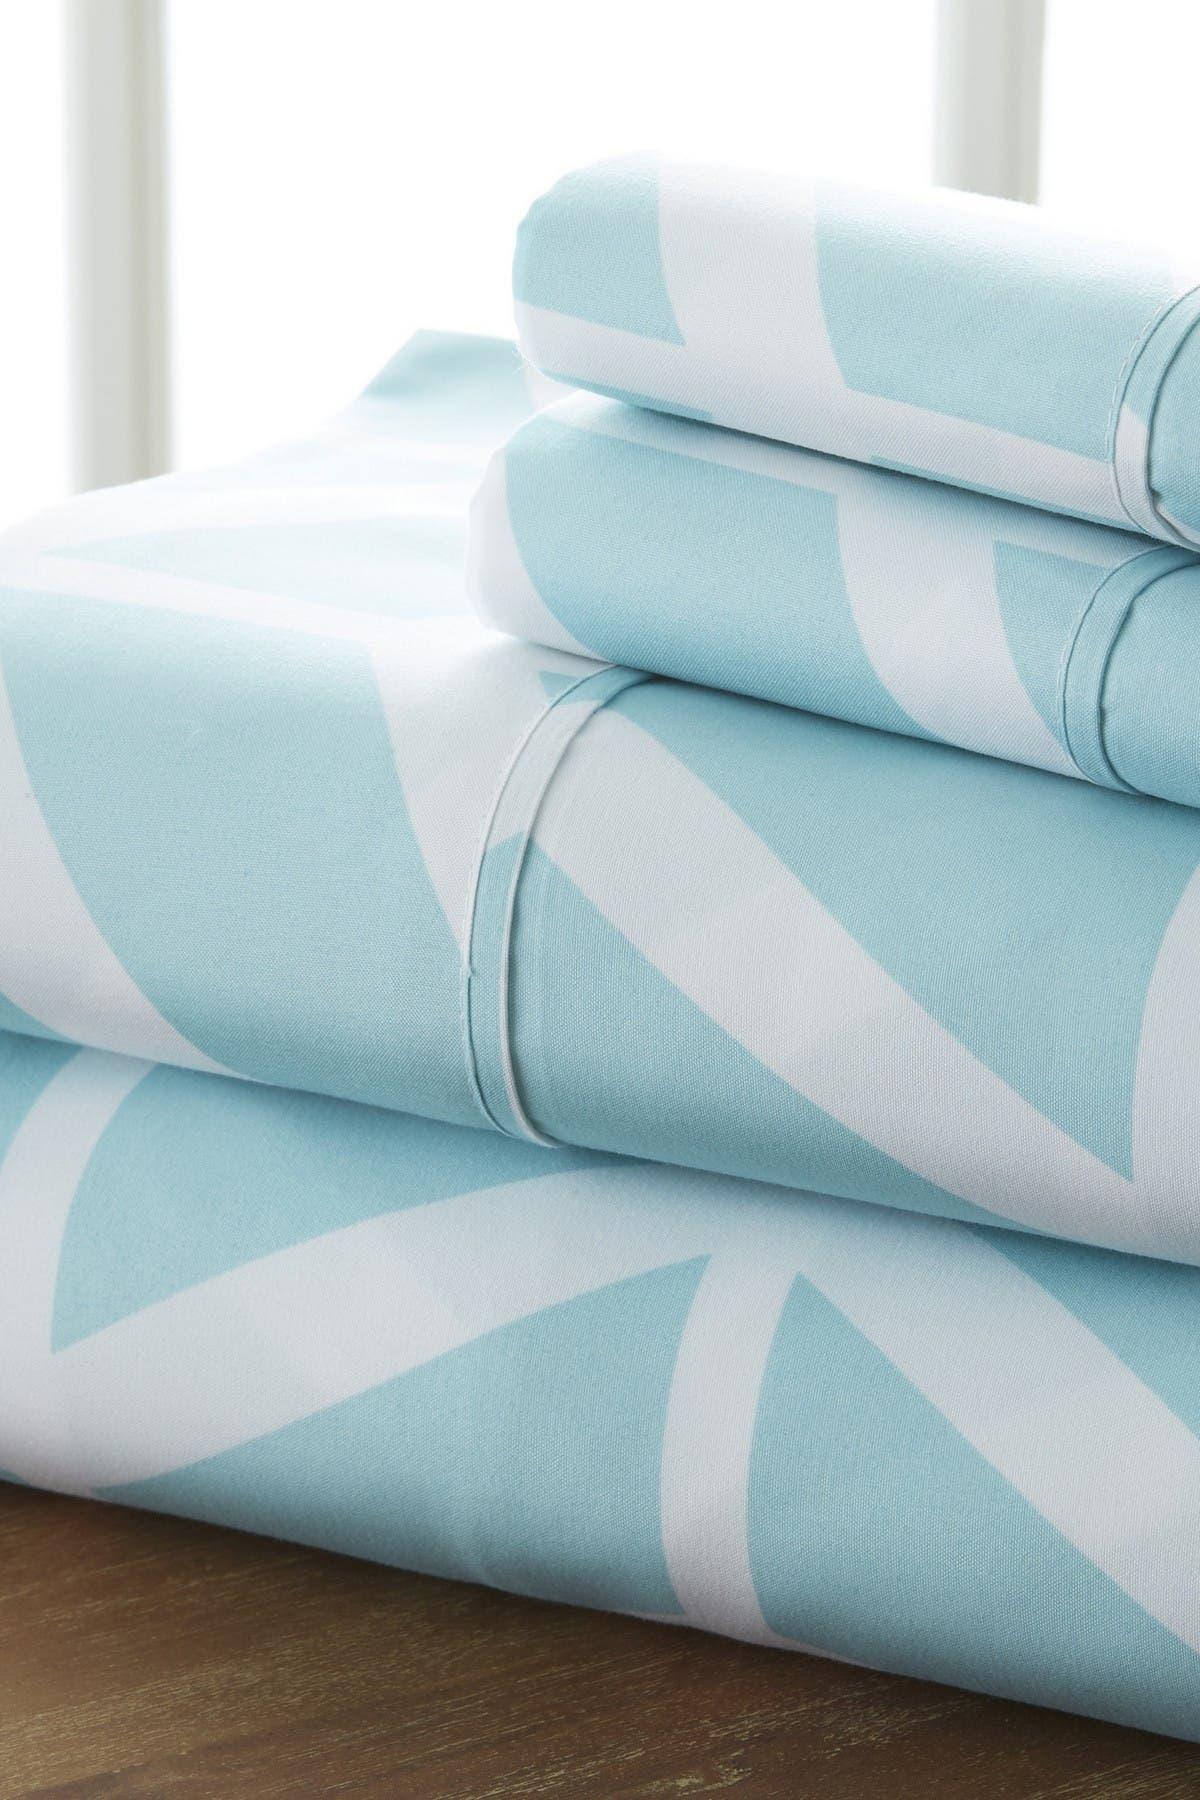 Image of IENJOY HOME Home Spun Premium Ultra Soft Arrow Pattern 4-Piece Full Bed Sheet Set - Turquoise